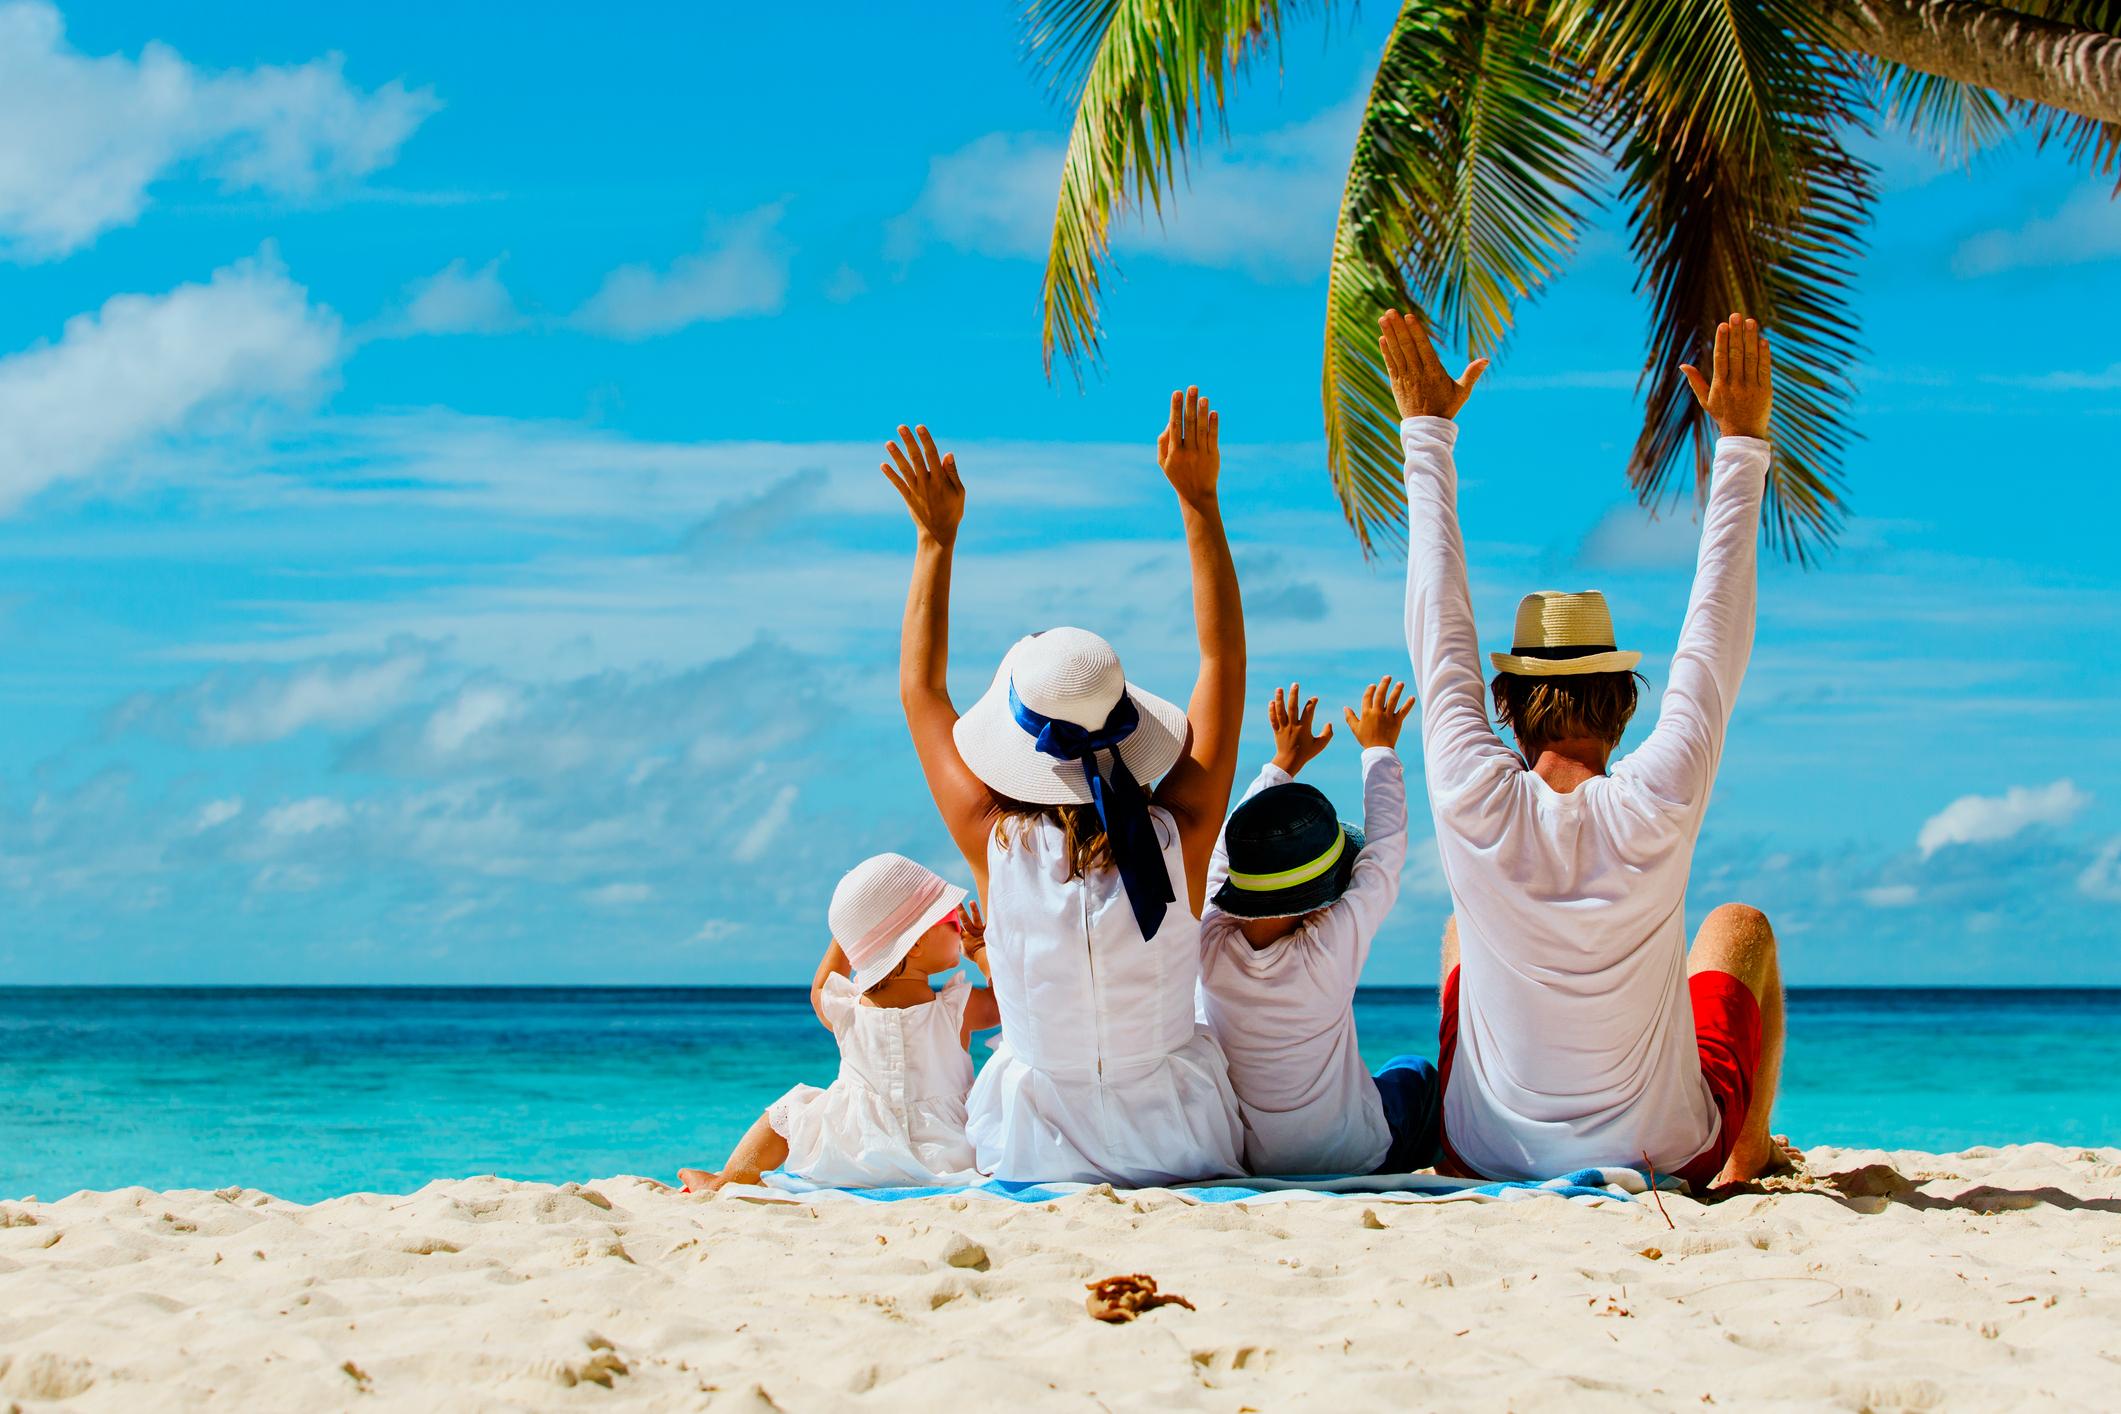 A happy family on the beach